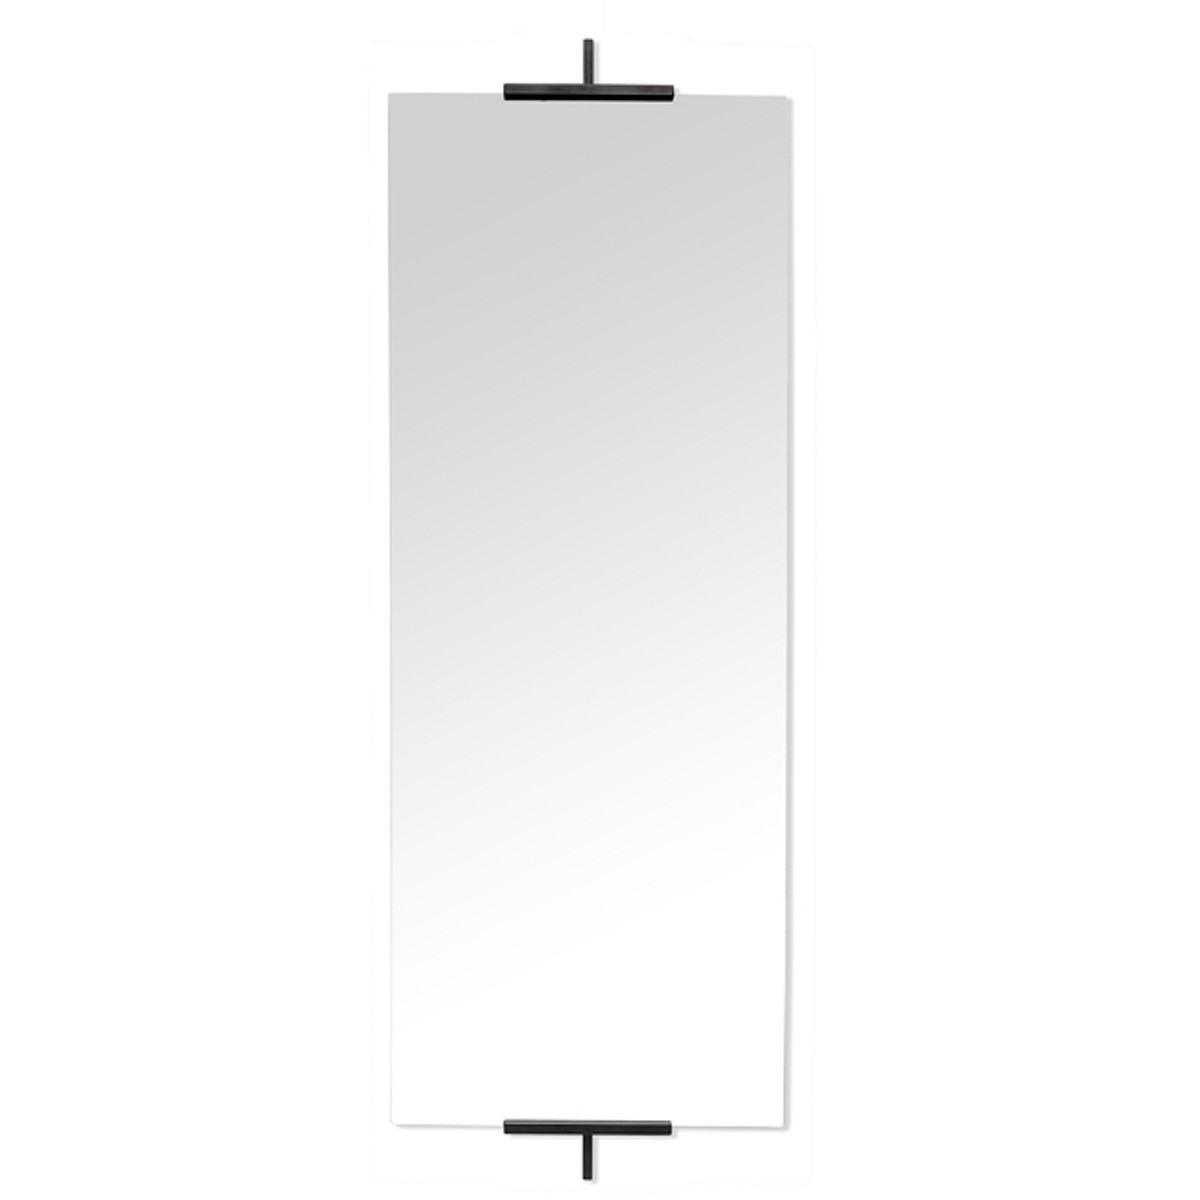 Kristina Dam Easel Mirror